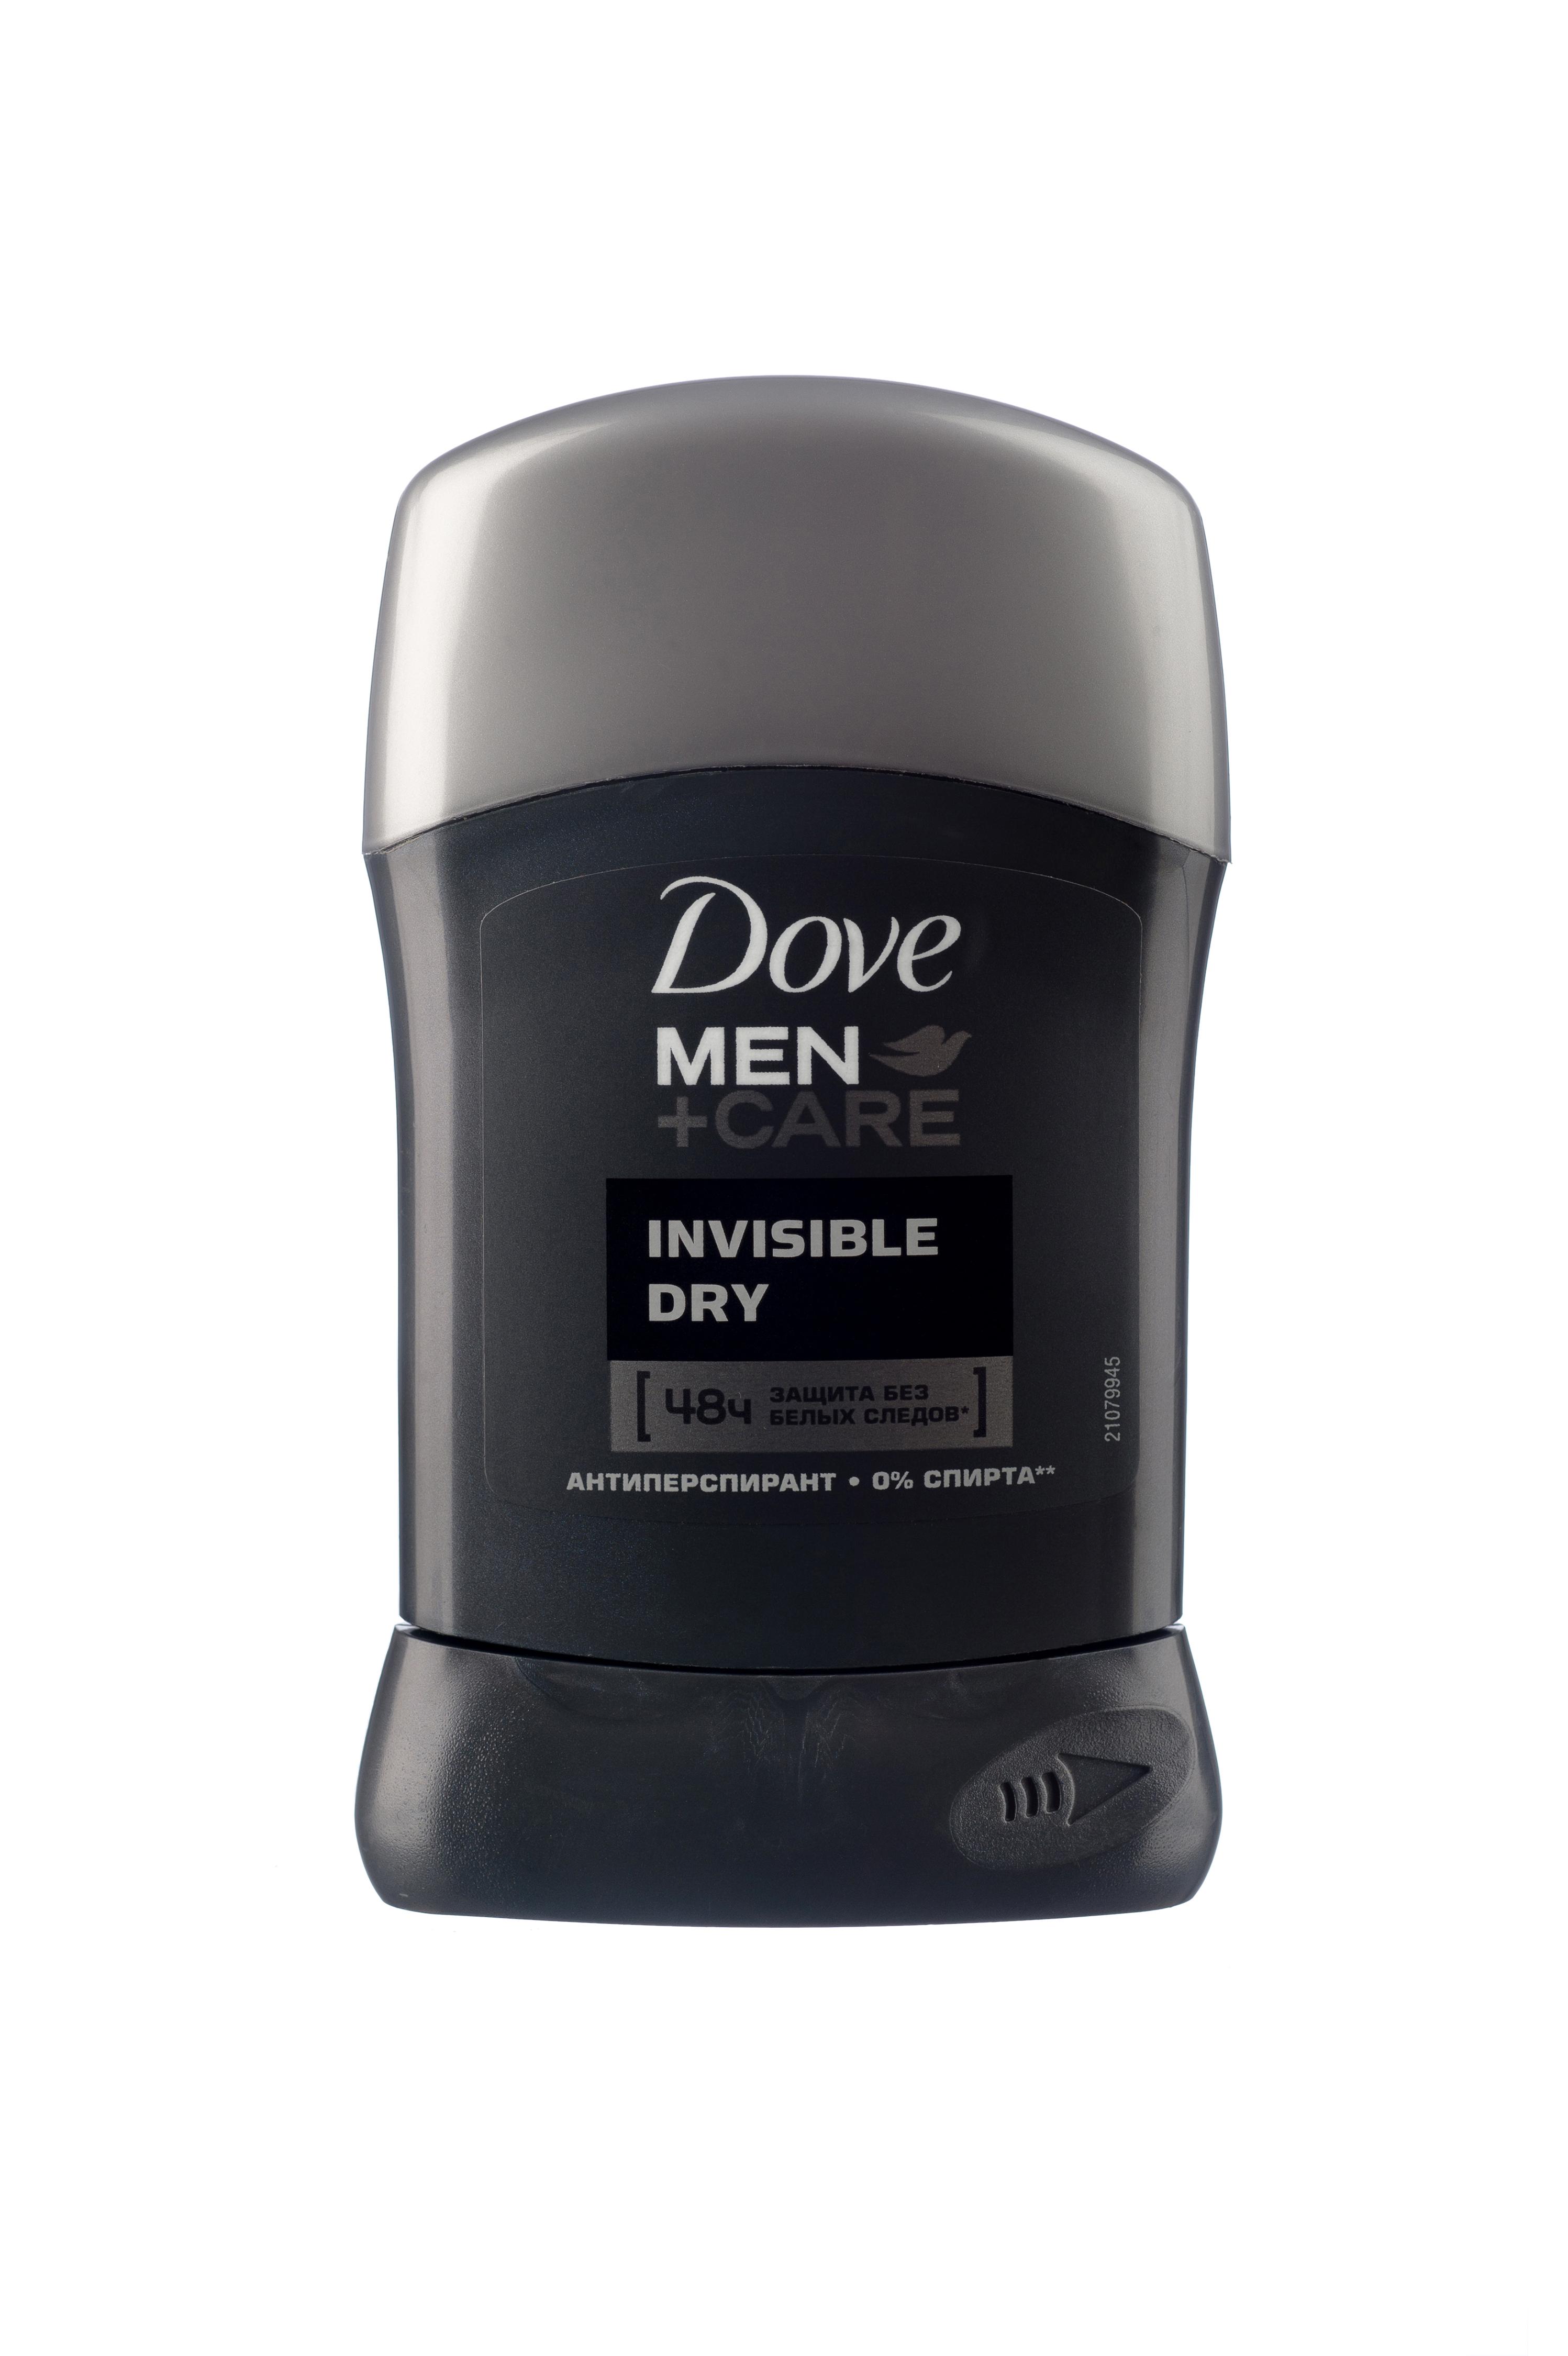 Dove Men+Care Антиперспирант карандаш Экстразащита без белых следов 50 мл дезодорант антиперспирант ролик мягкость хлопка 50мл dove